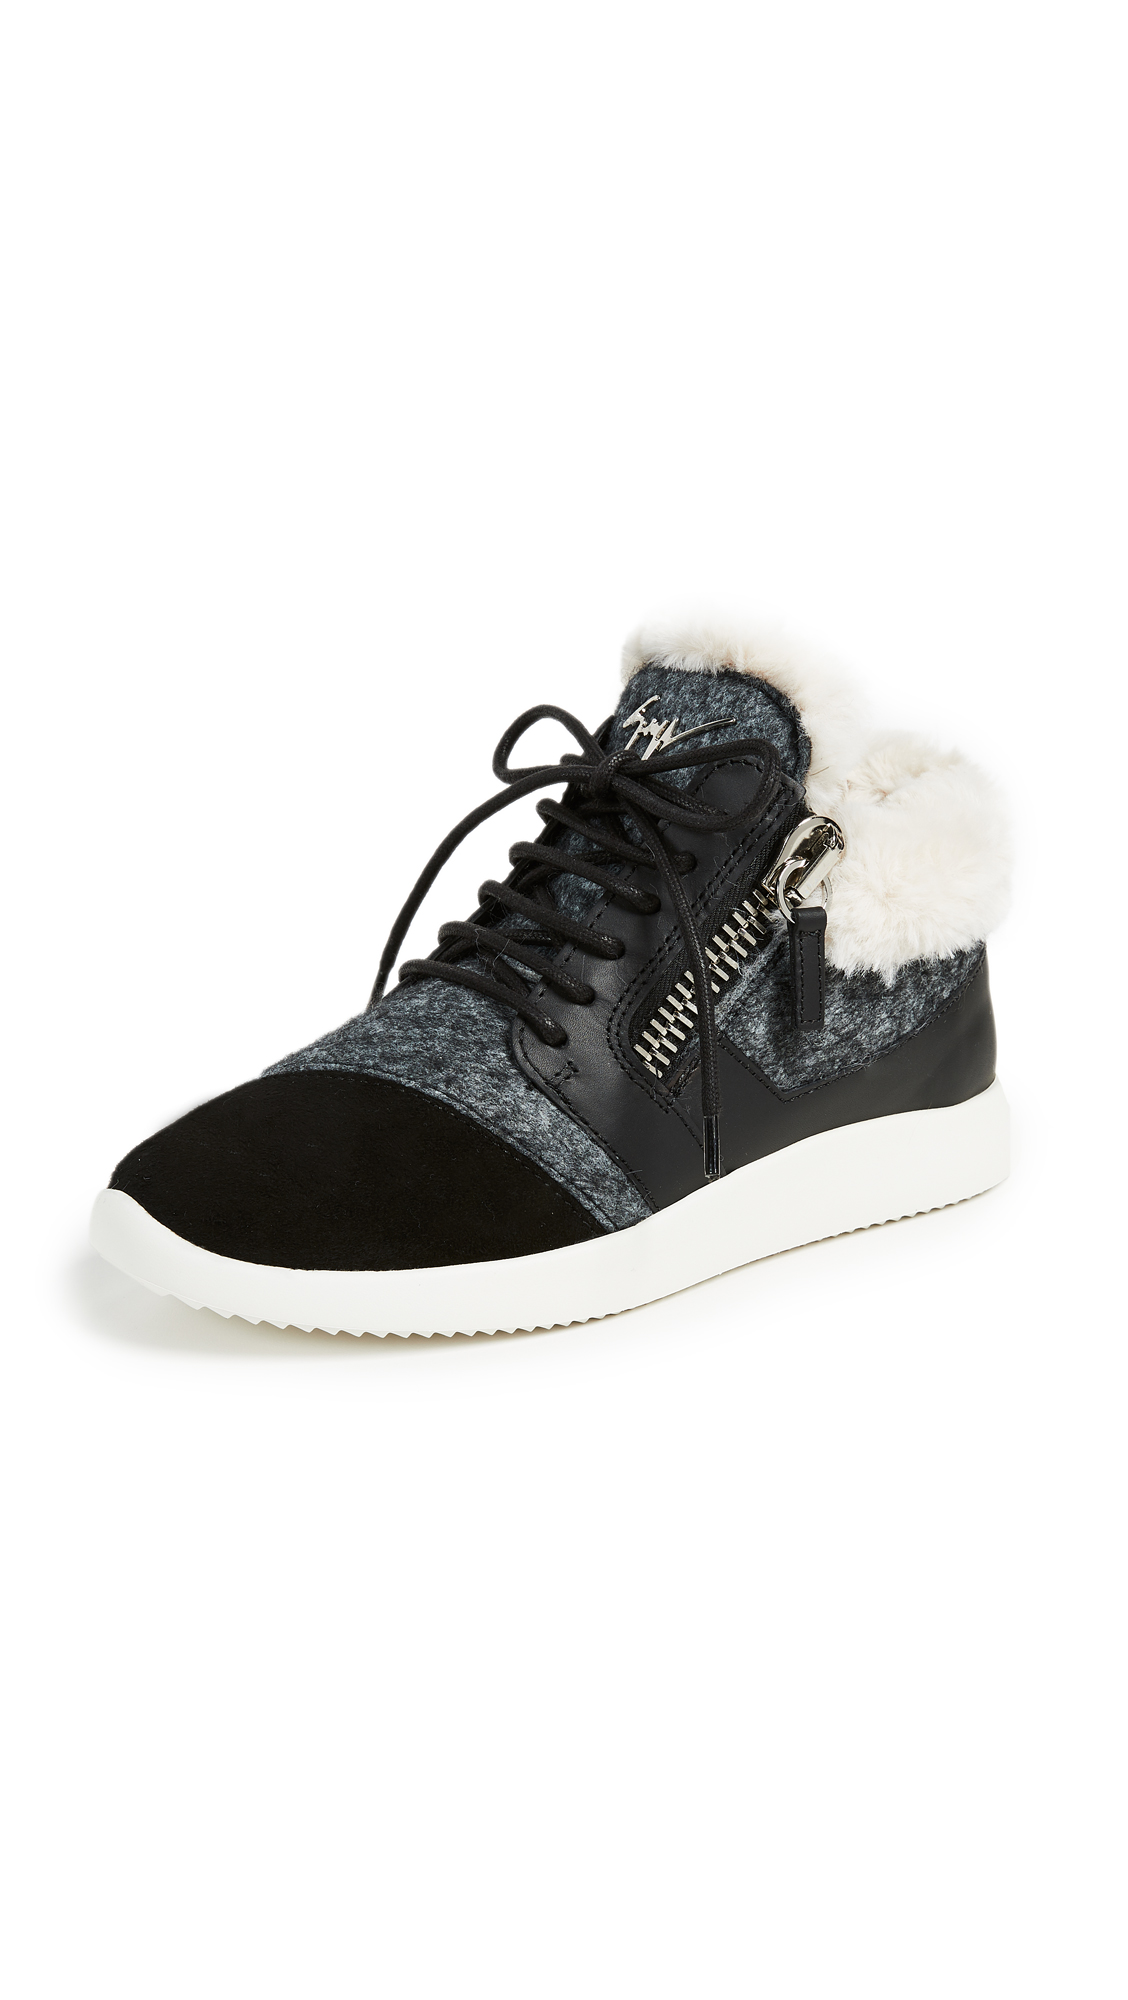 Giuseppe Zanotti Faux Fur Lined Sneakers - Nero